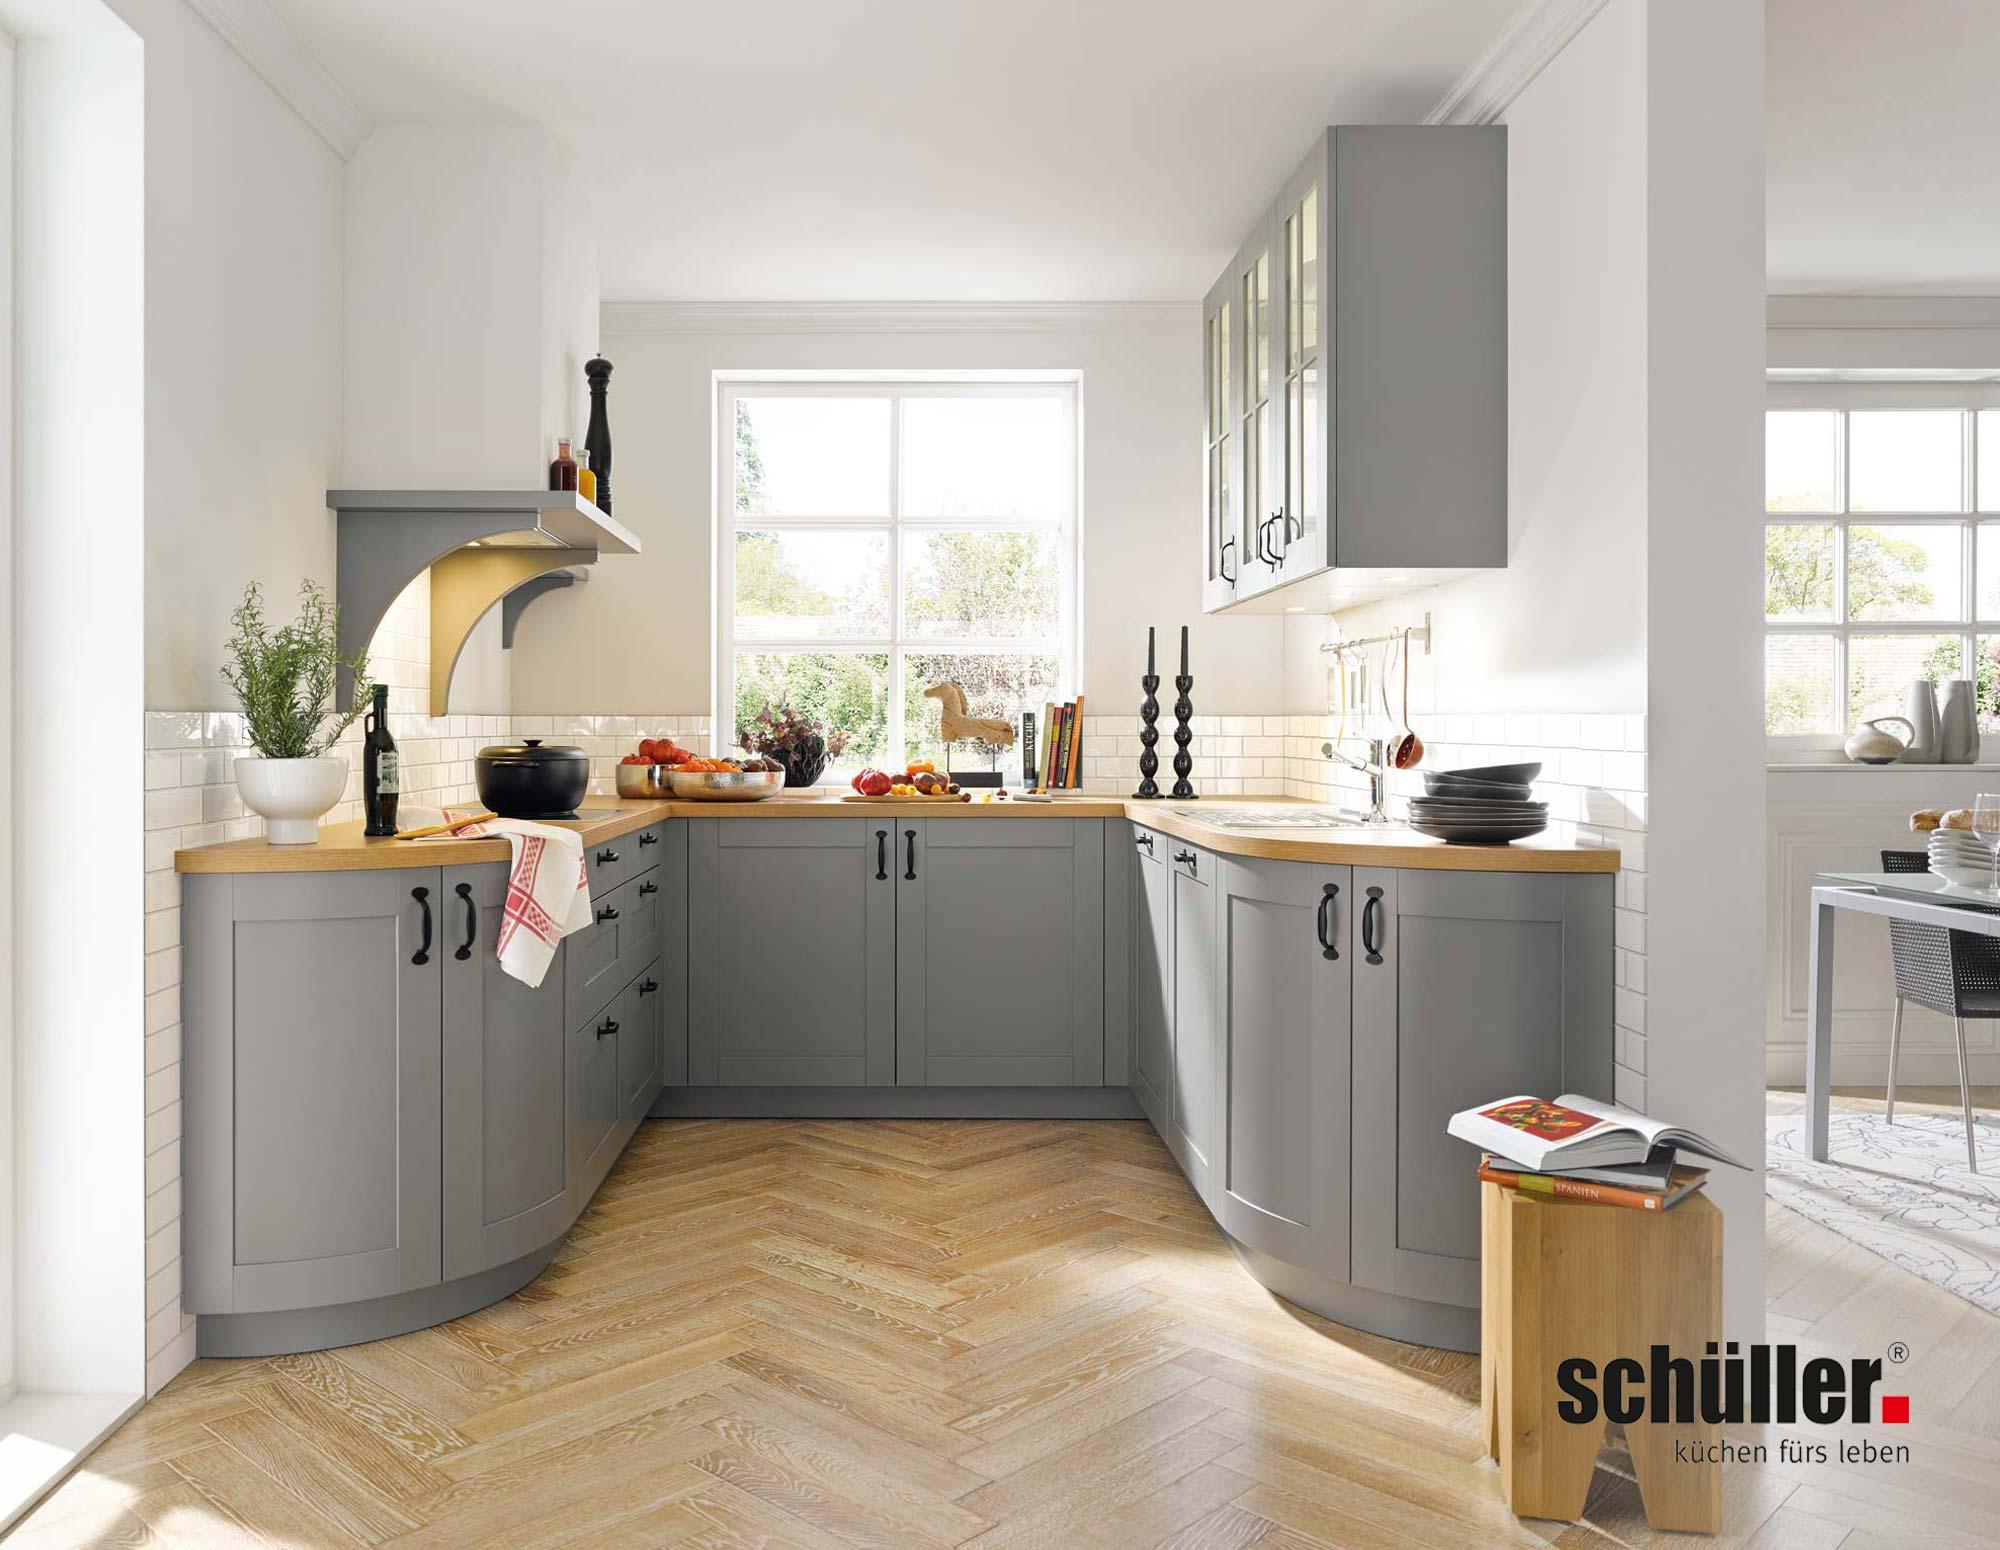 Schüller Casa Landhausküche in Grau